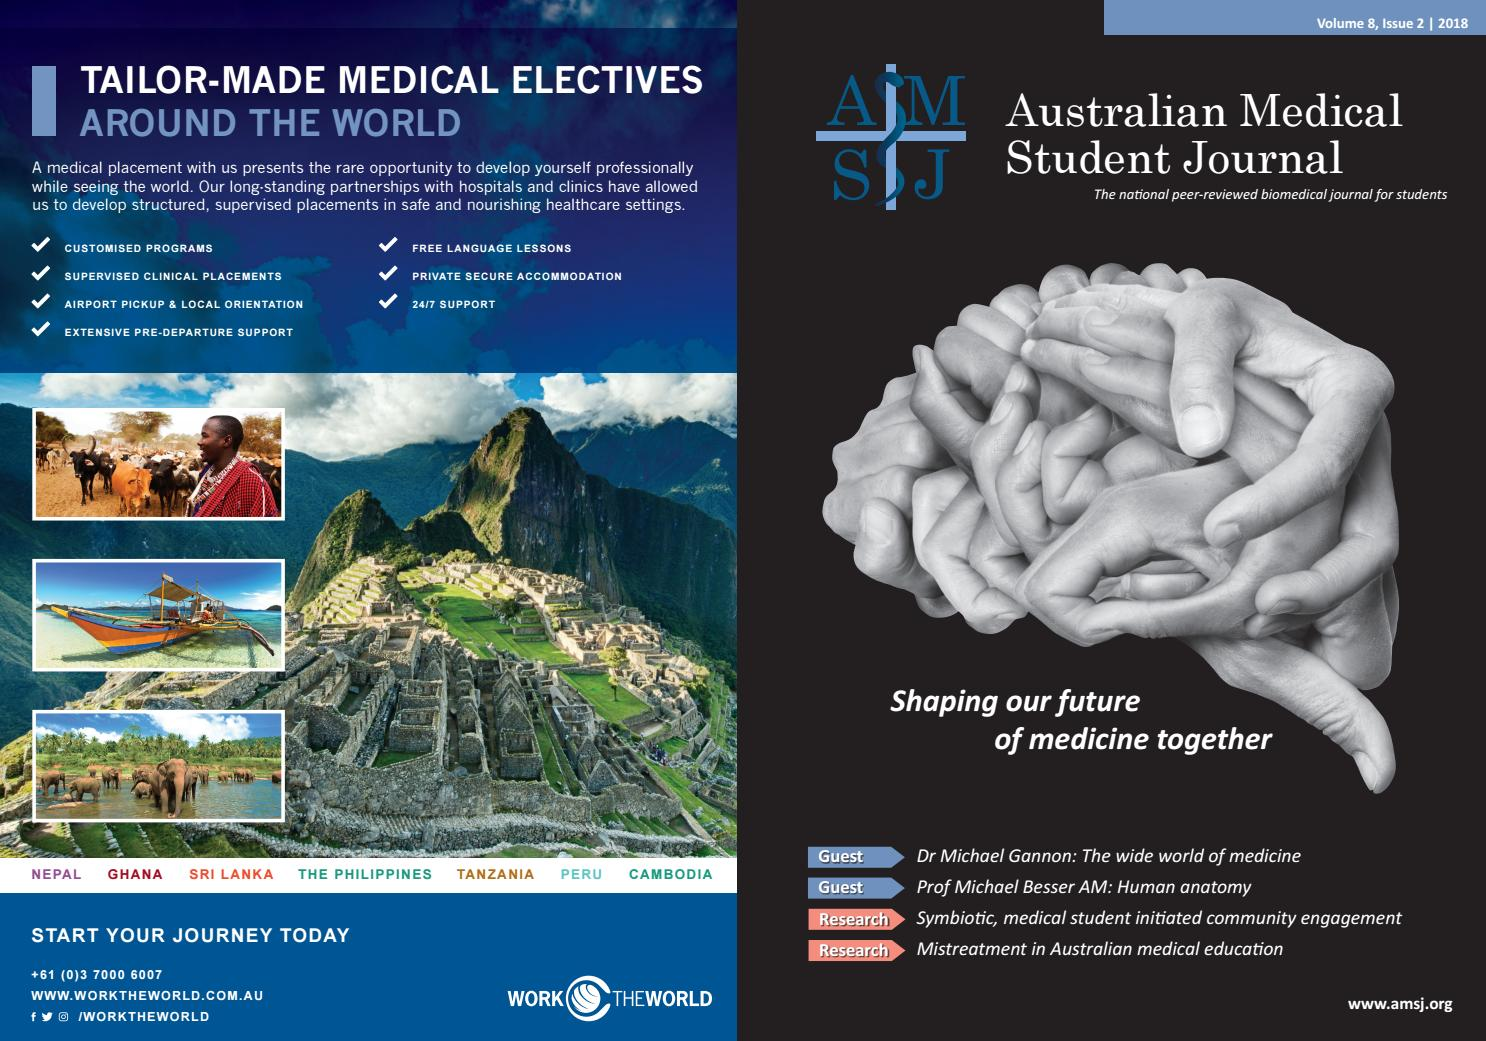 AMSJ Volume 8, Issue 2 2018 by Australian Medical Student Journal ...